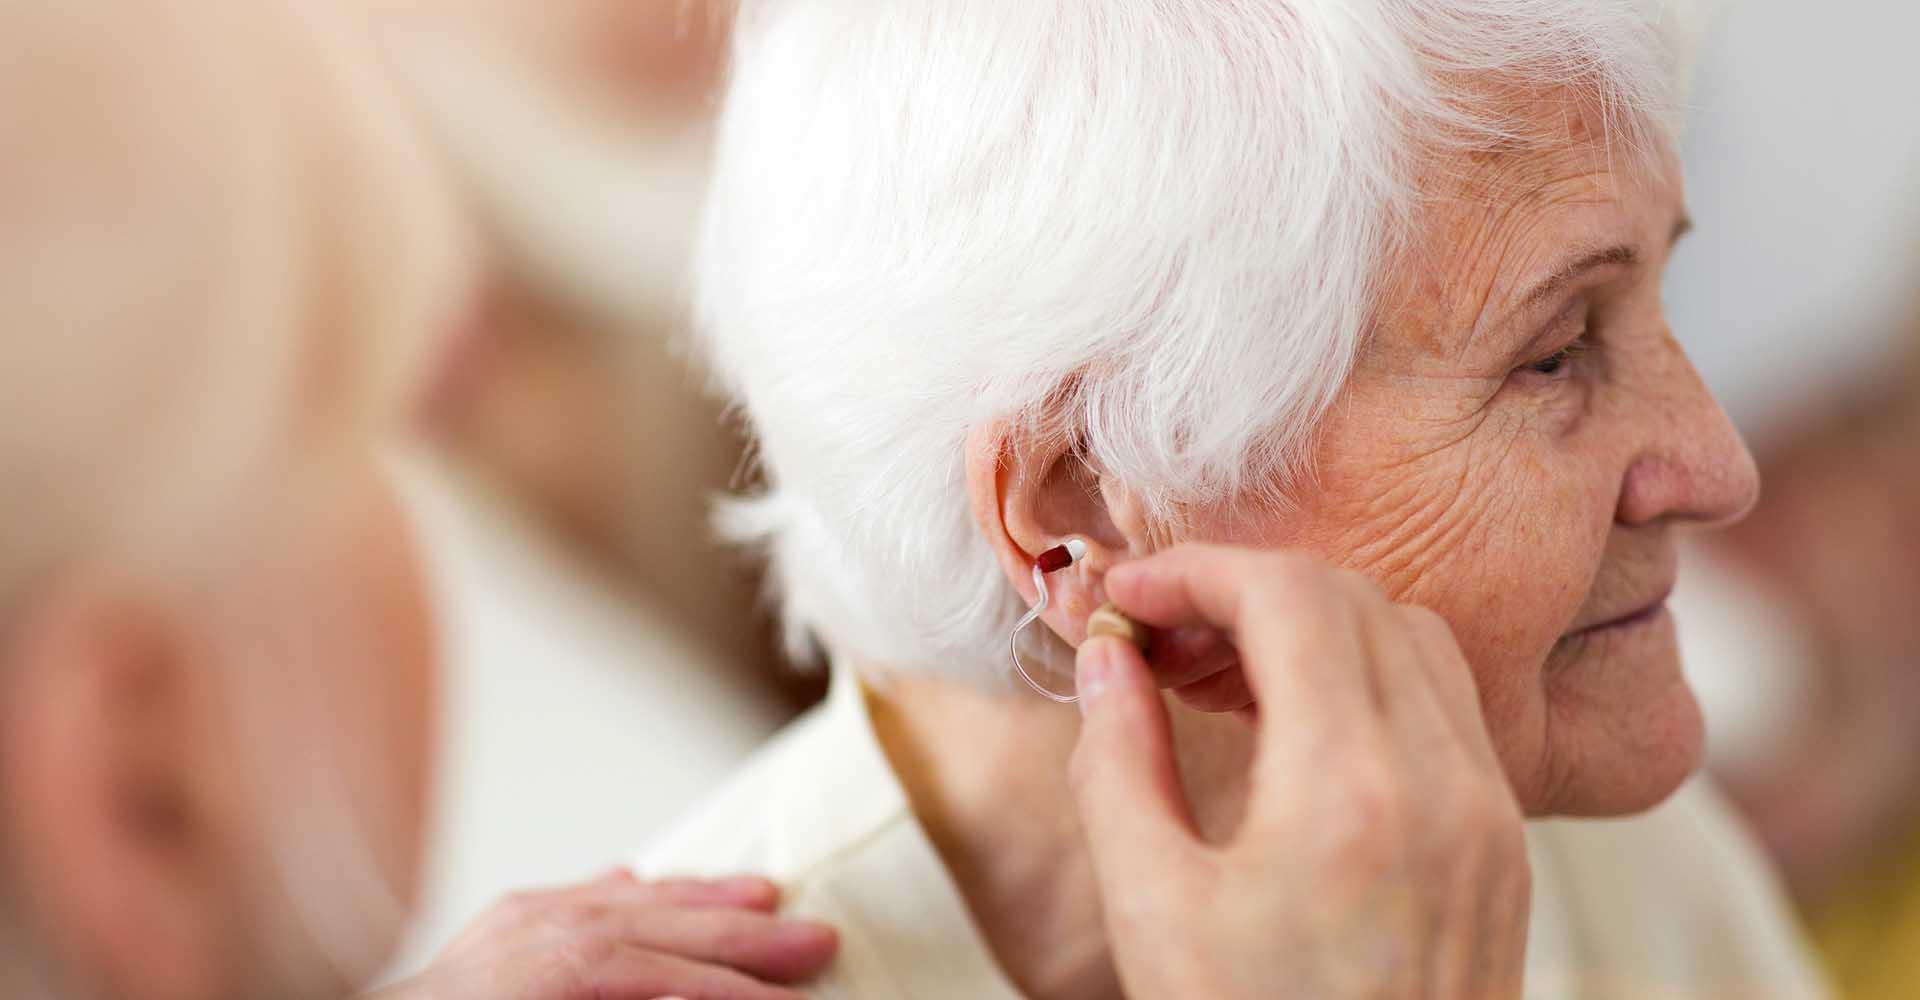 Female doctor applying hearing aid to senior woman's ear